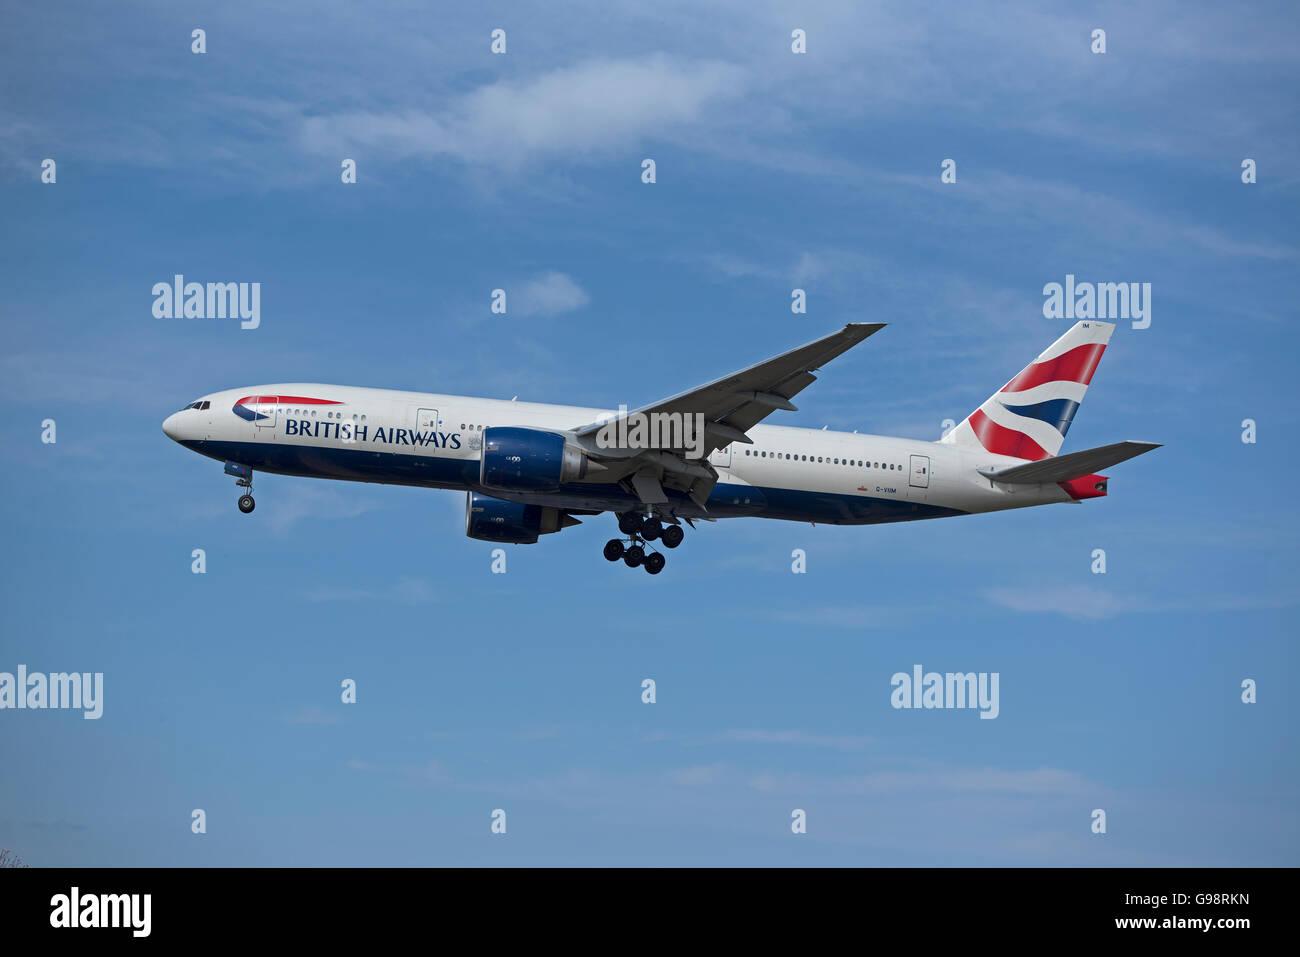 British Airways Boeing 777-236 Registration G-VIMM on approach to London Heathrow Airport.  SCO 10,468. - Stock Image